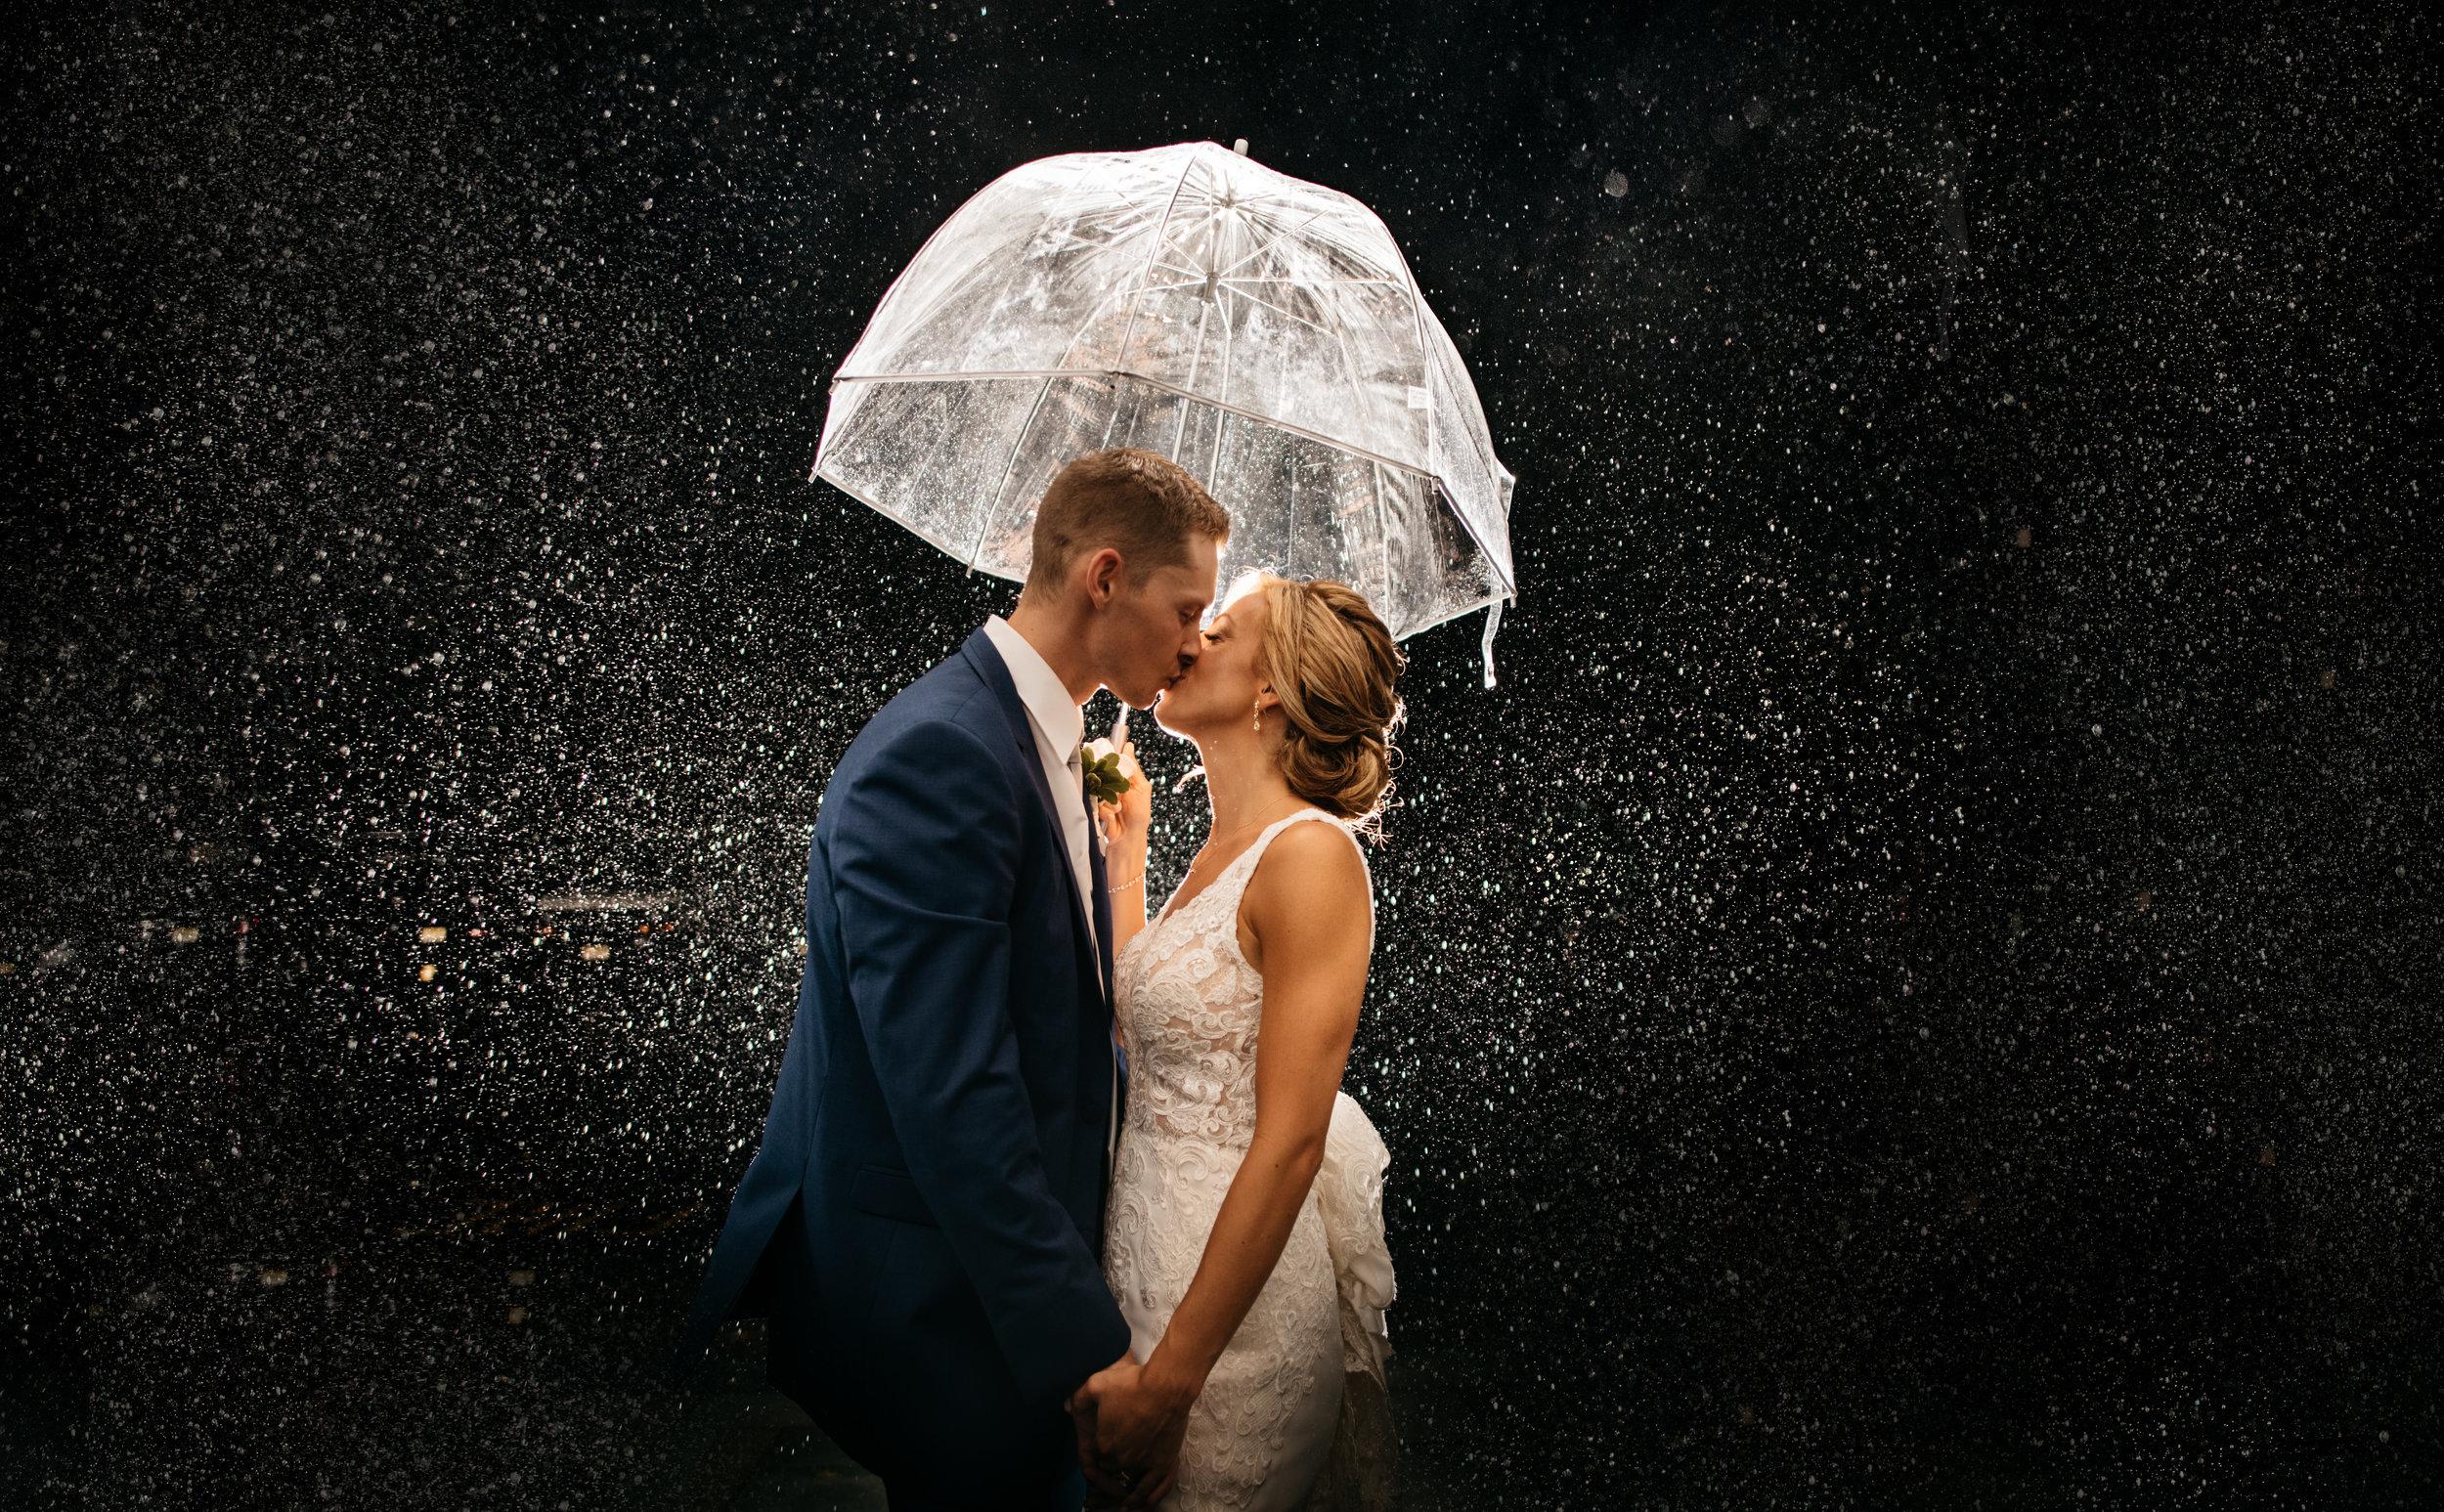 WeddingPhotos | NJPhotographer | Highlights-11-8.jpg